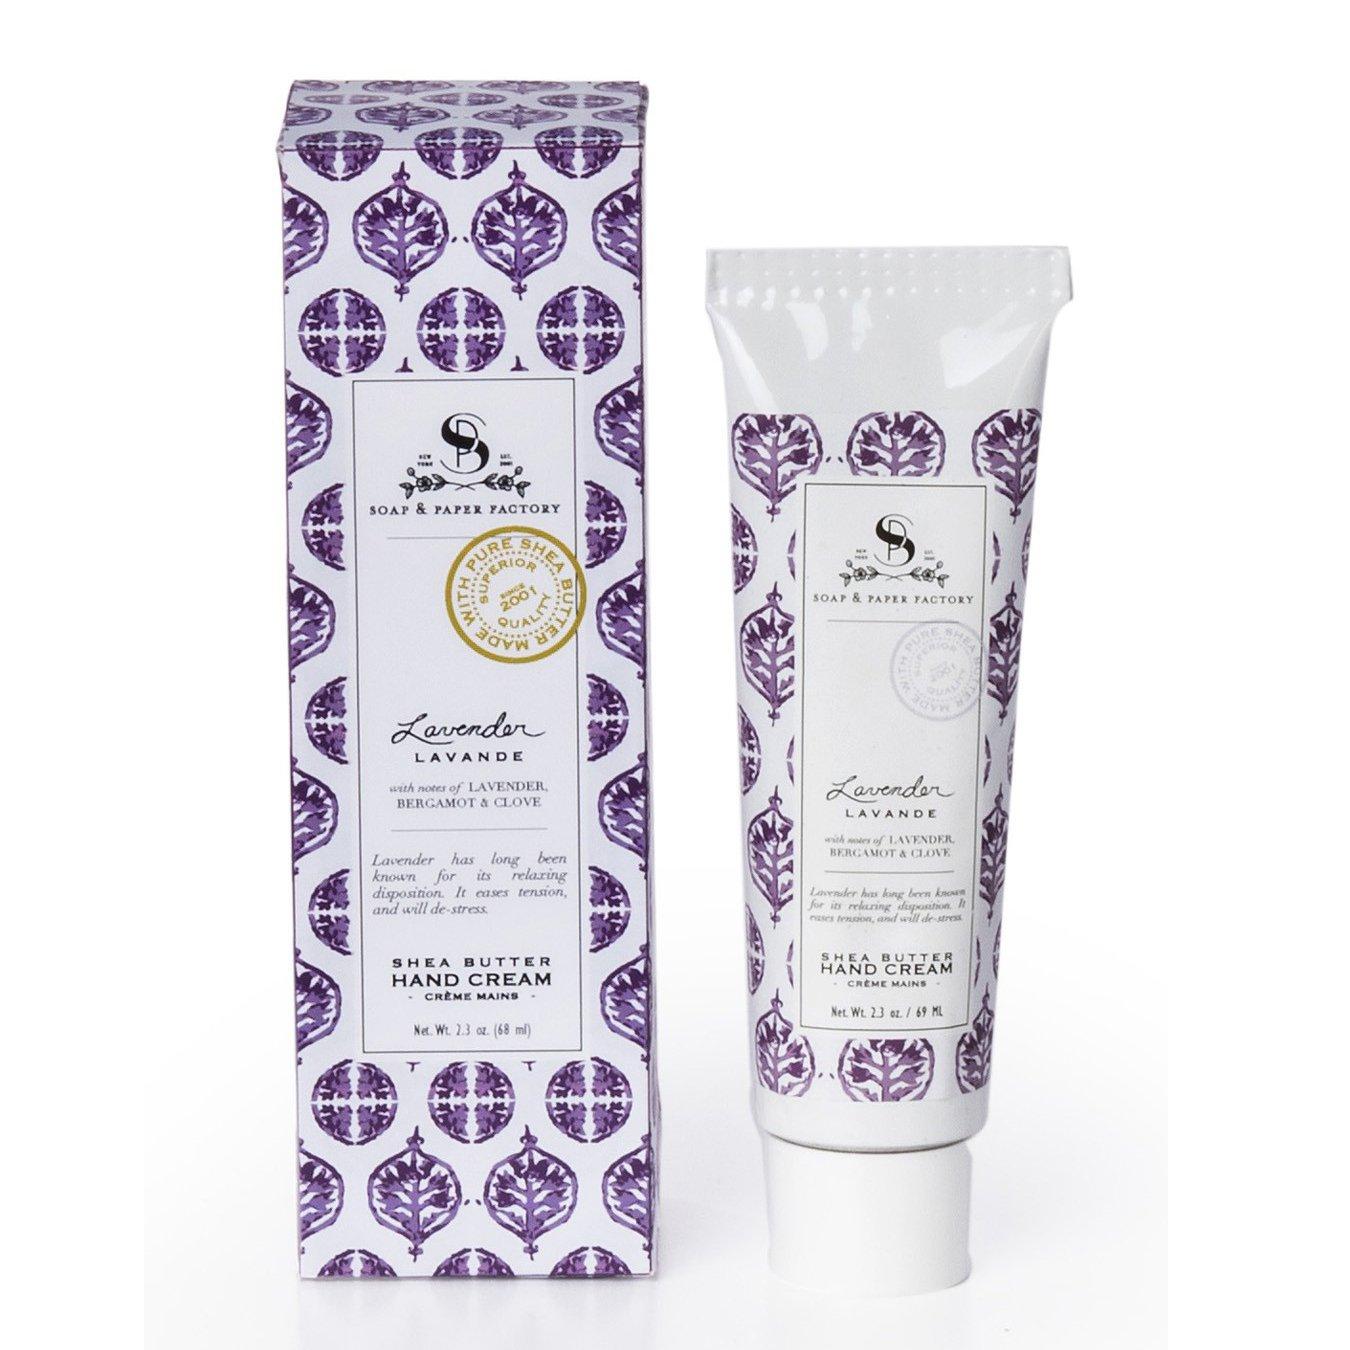 The Soap & Paper Factory Lavender Shea Butter Hand Cream, 2.3 oz